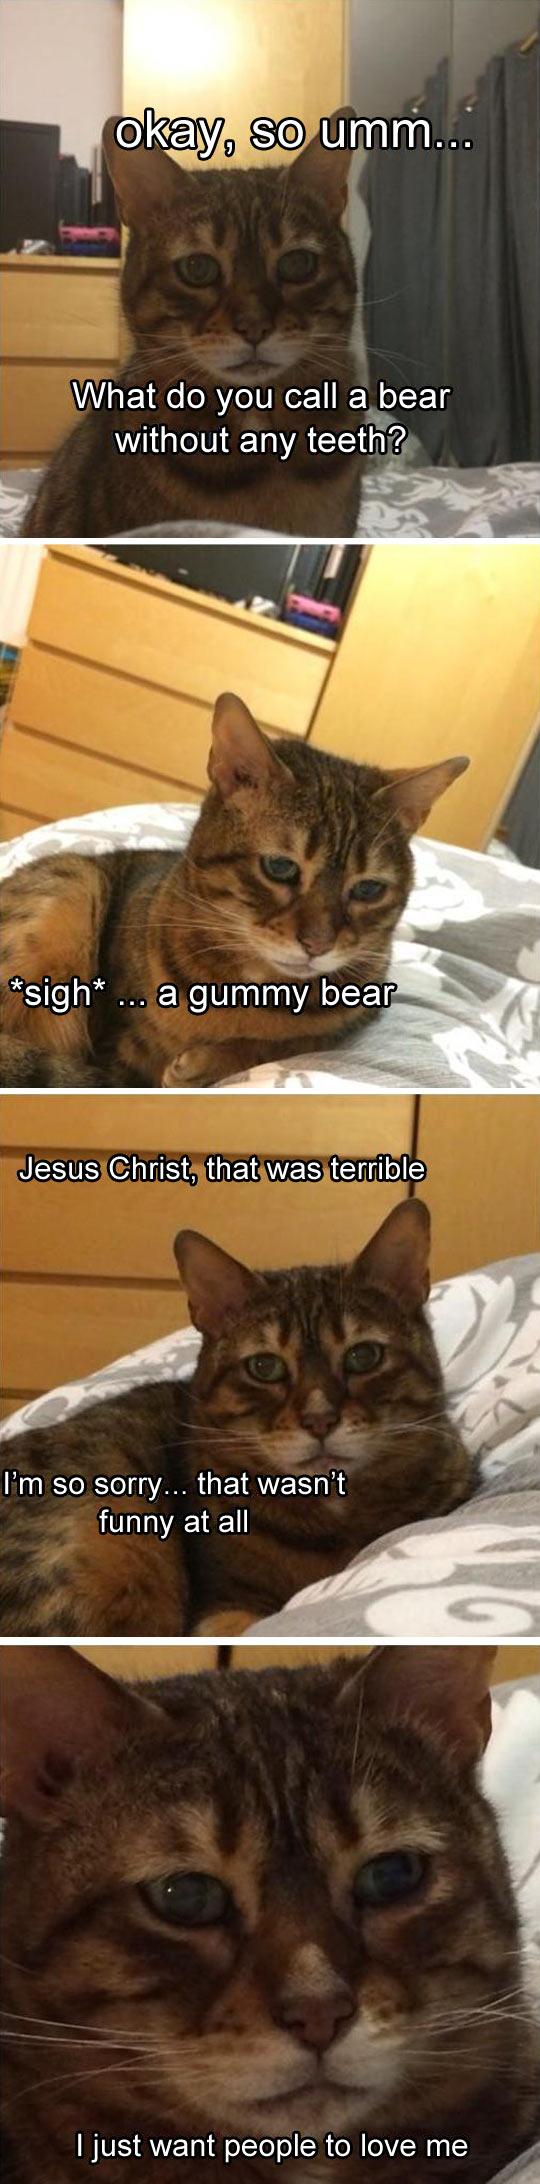 funny-sad-cat-telling-jokes